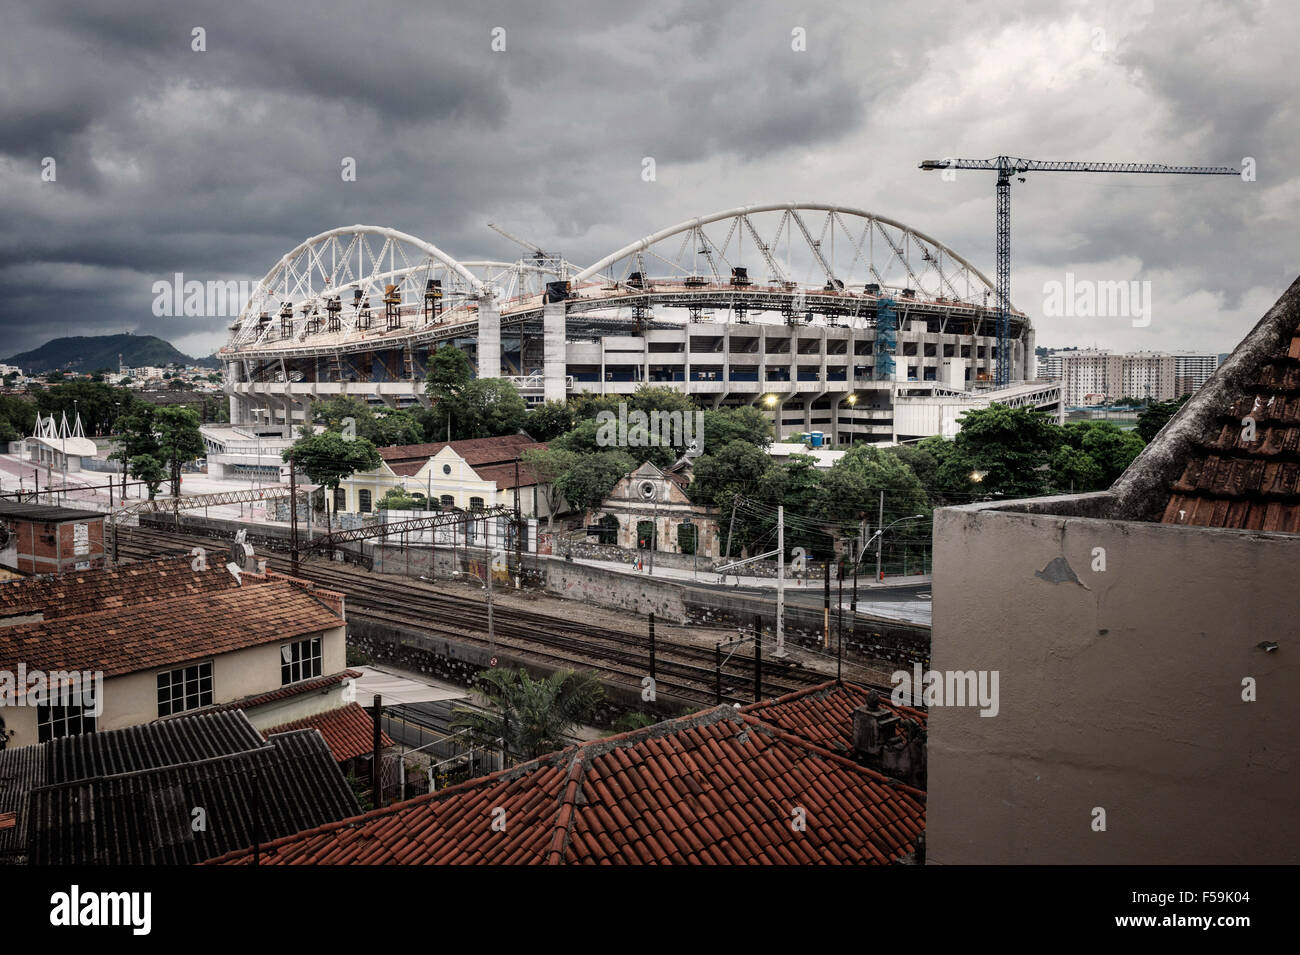 Rio De Janeiro Brazil Homeless Stockfotos & Rio De Janeiro Brazil ...